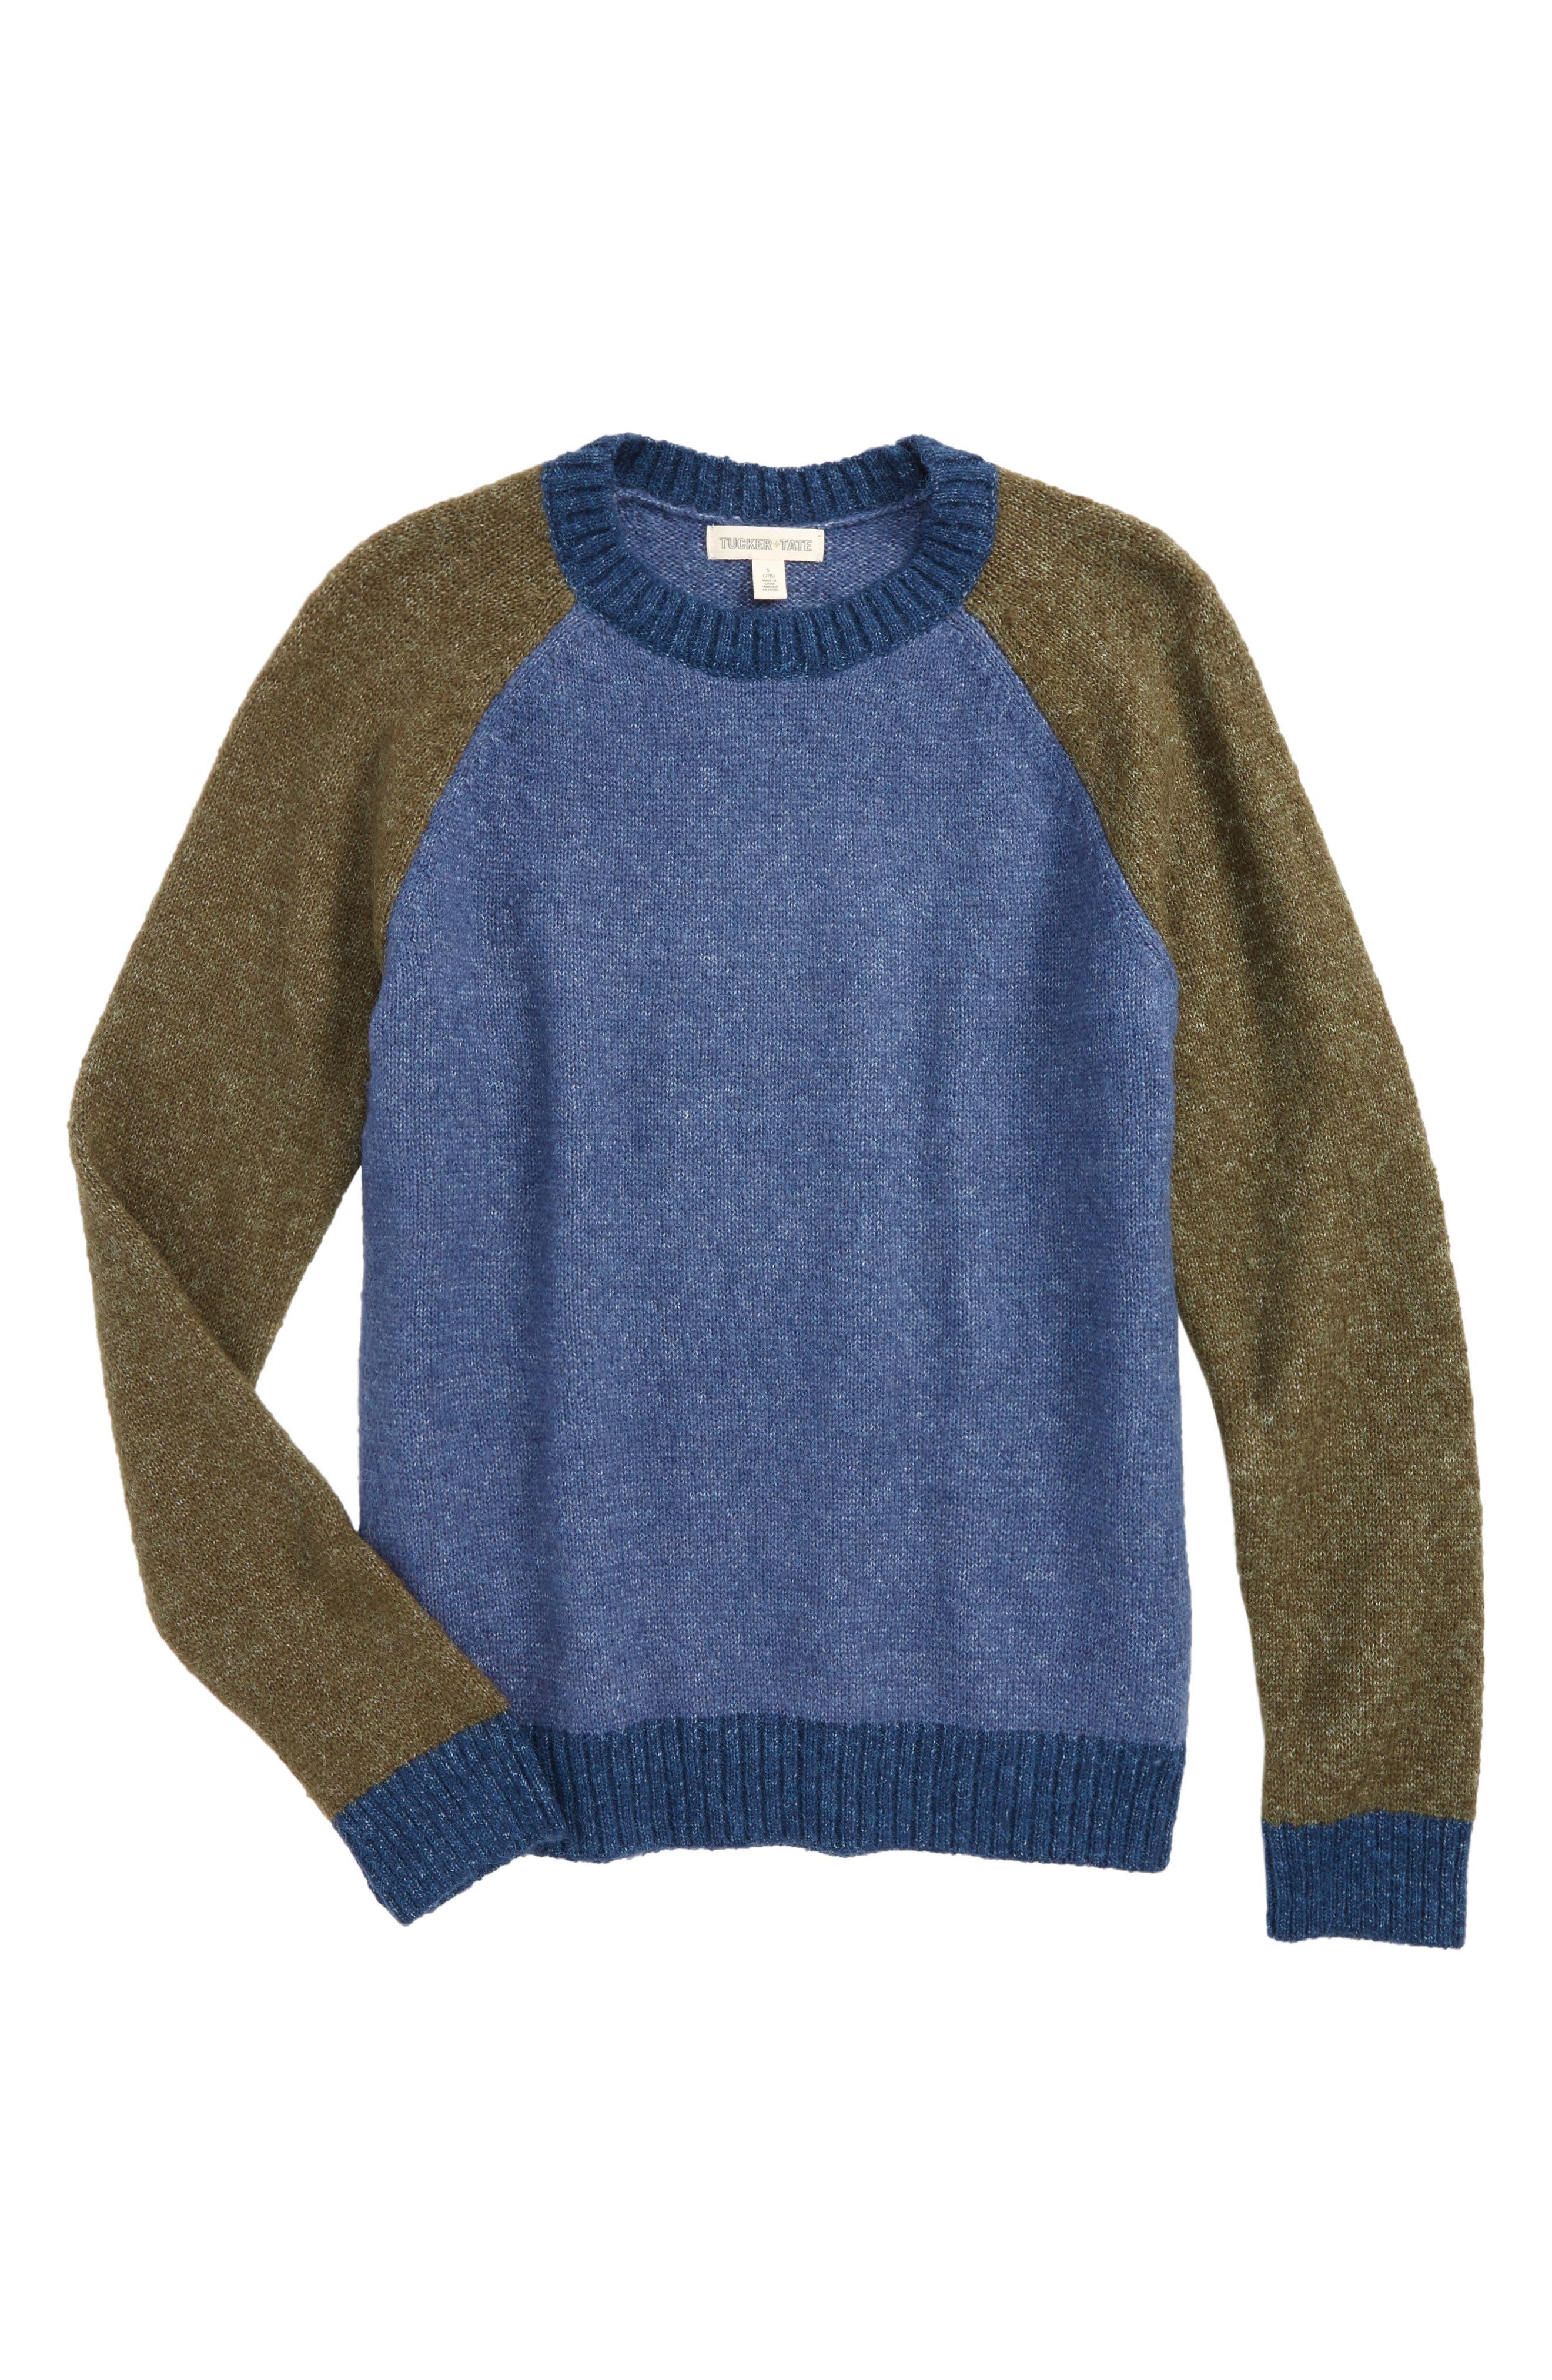 Alternate Image 1 Selected - Tucker + Tate Colorblock Knit Sweater (Big Boys)